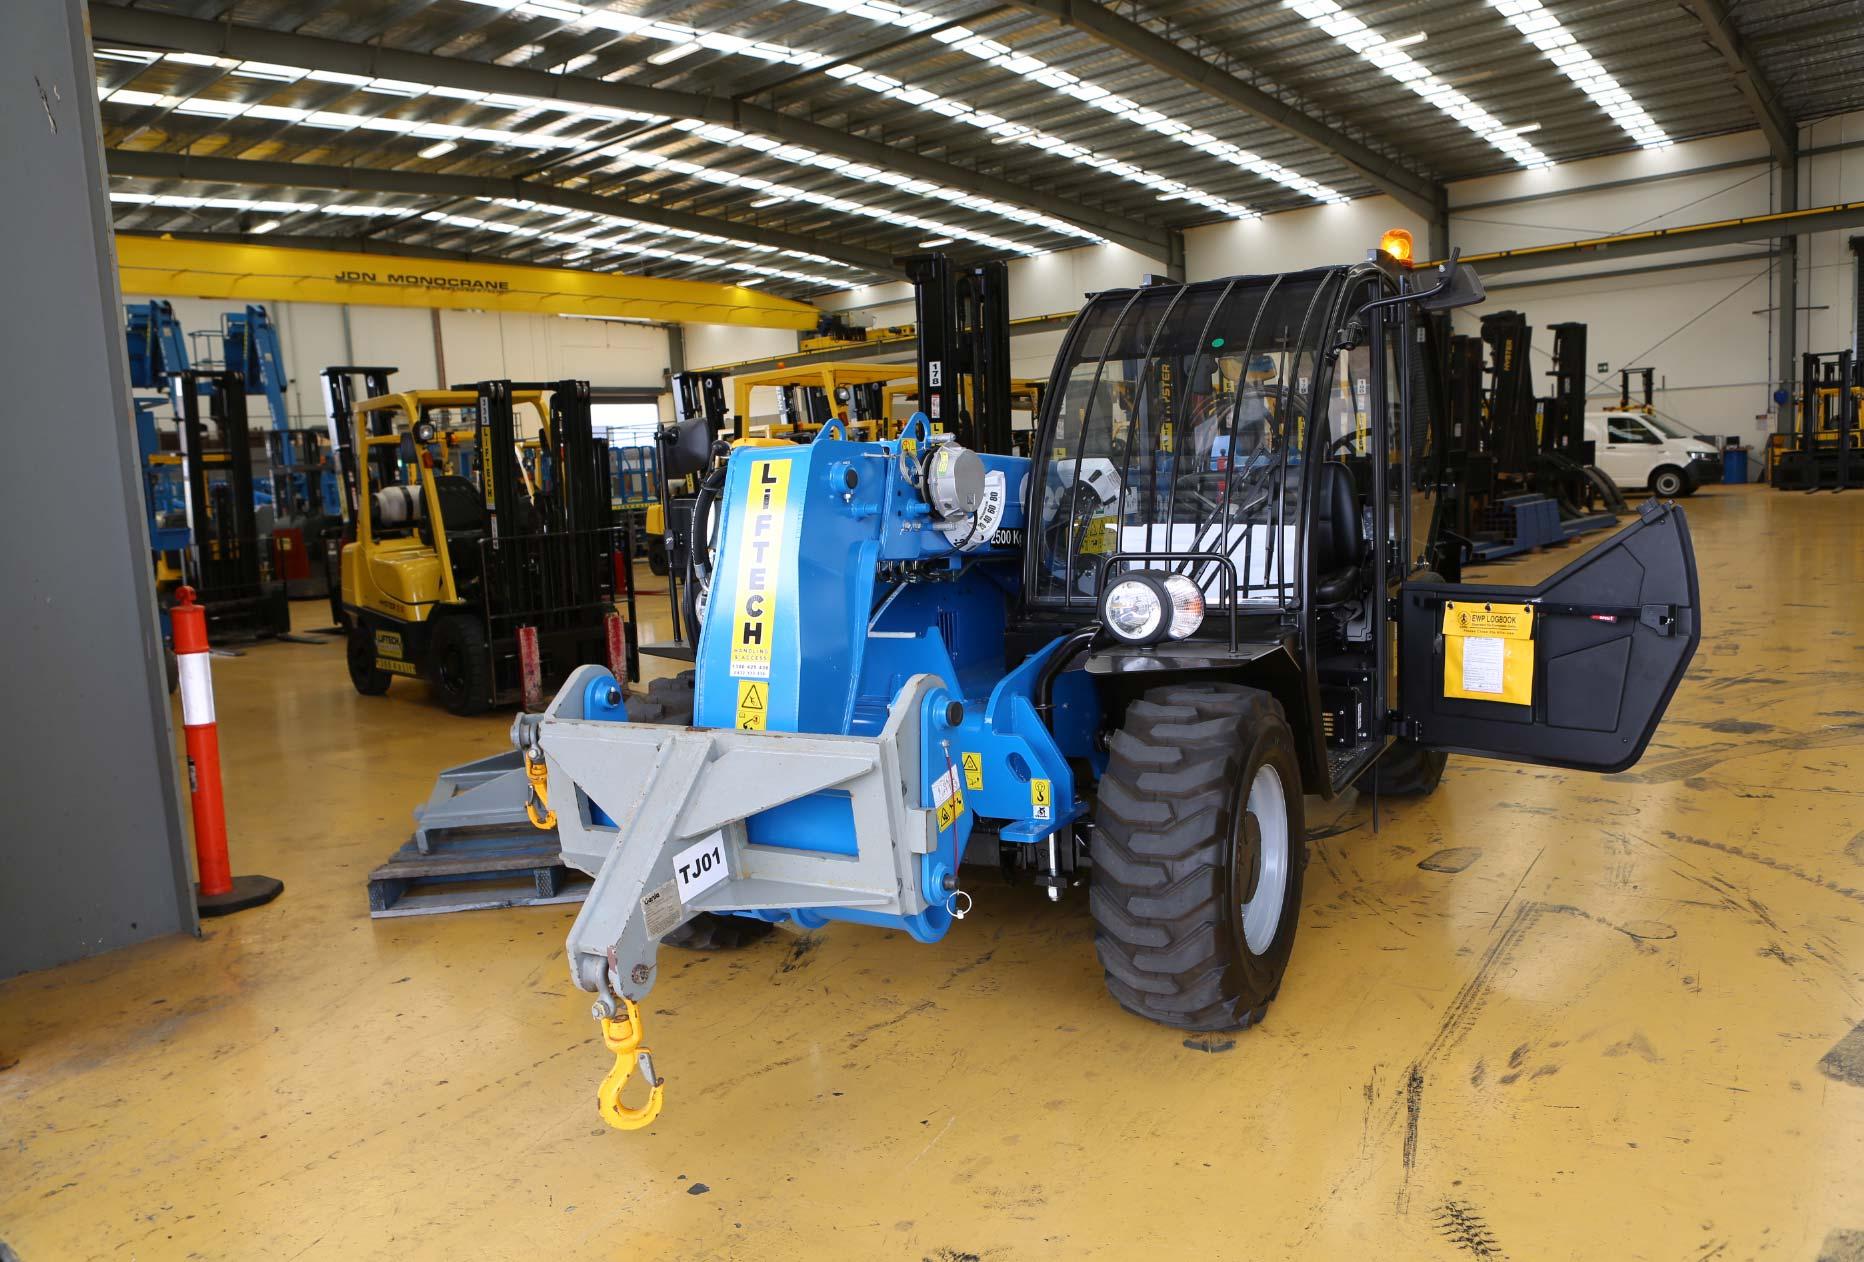 Attachment Of 2.5 Tonne Telehandler Forklift